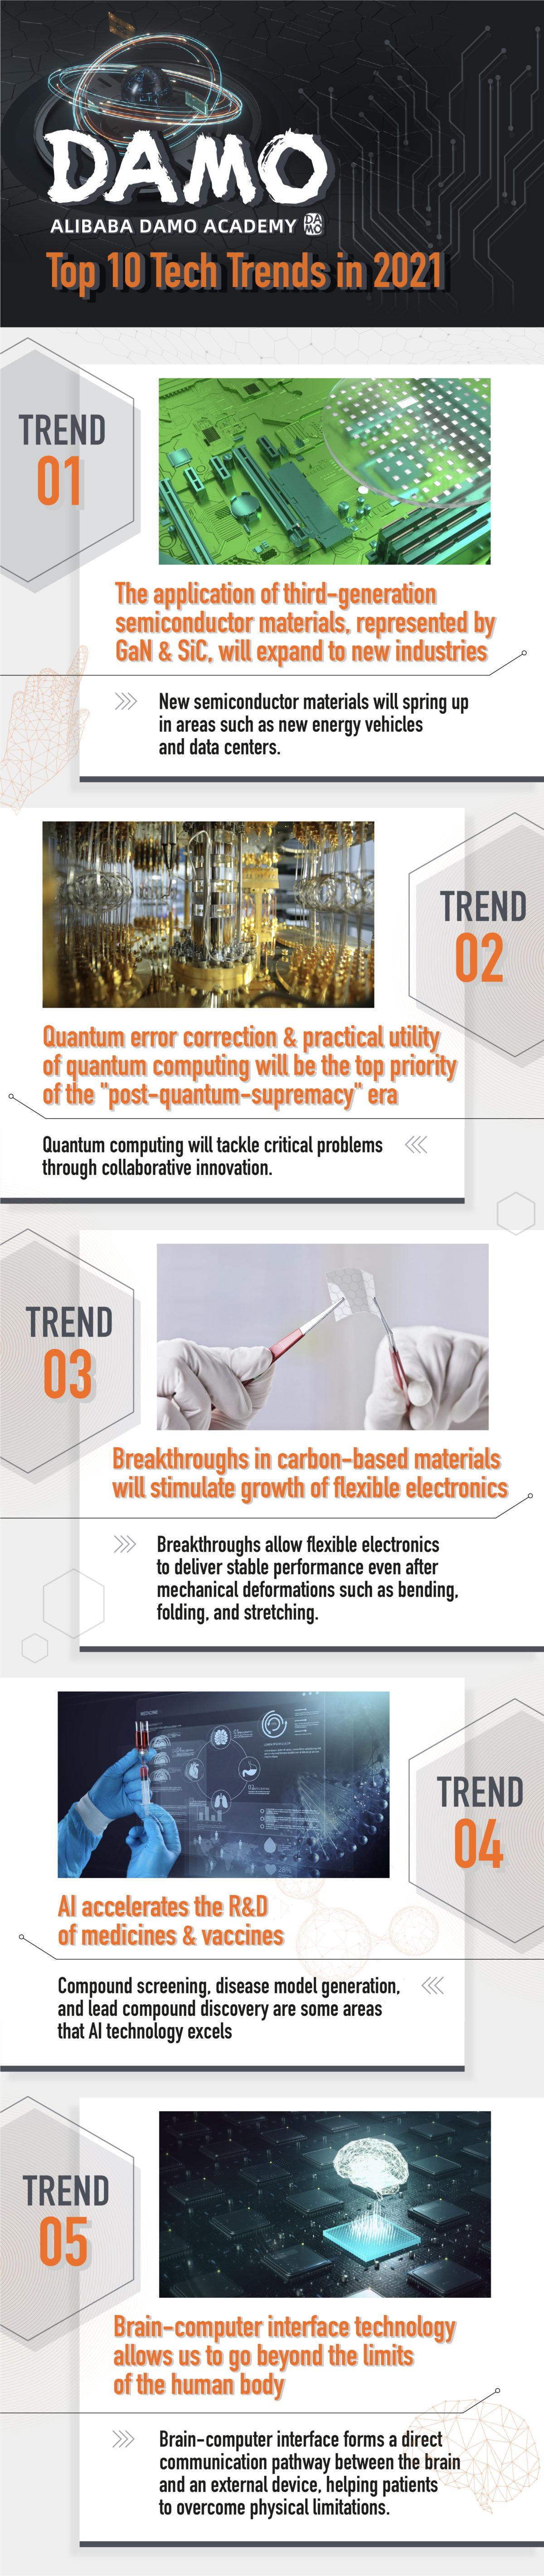 Alibaba_Damo Academy 2021 Tech Trend_Infographic (ENG) 01